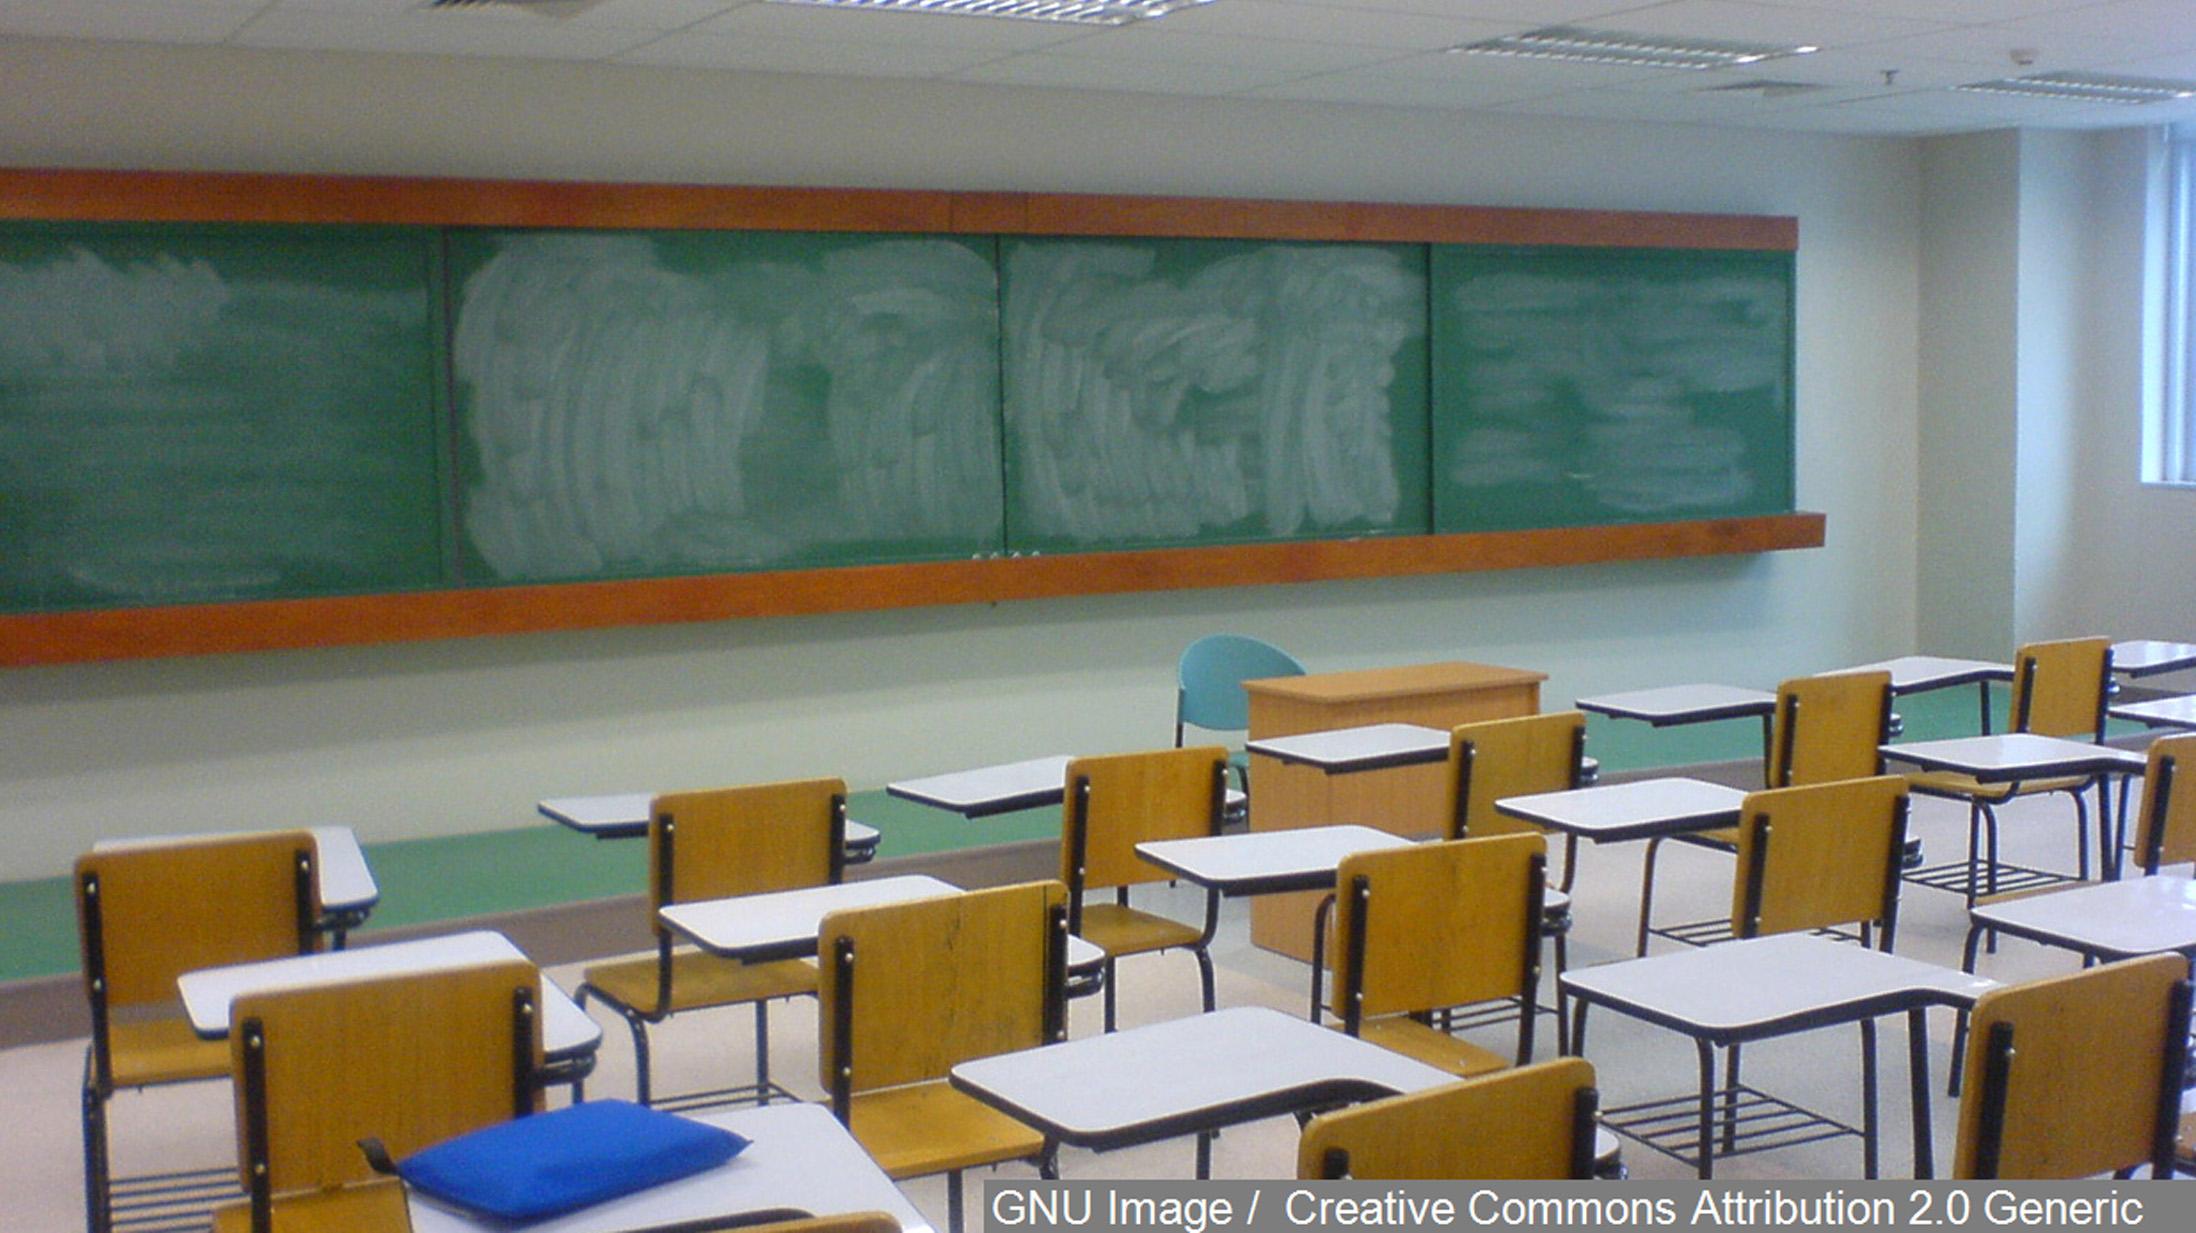 Classroom 10122015_1456808352934.jpg